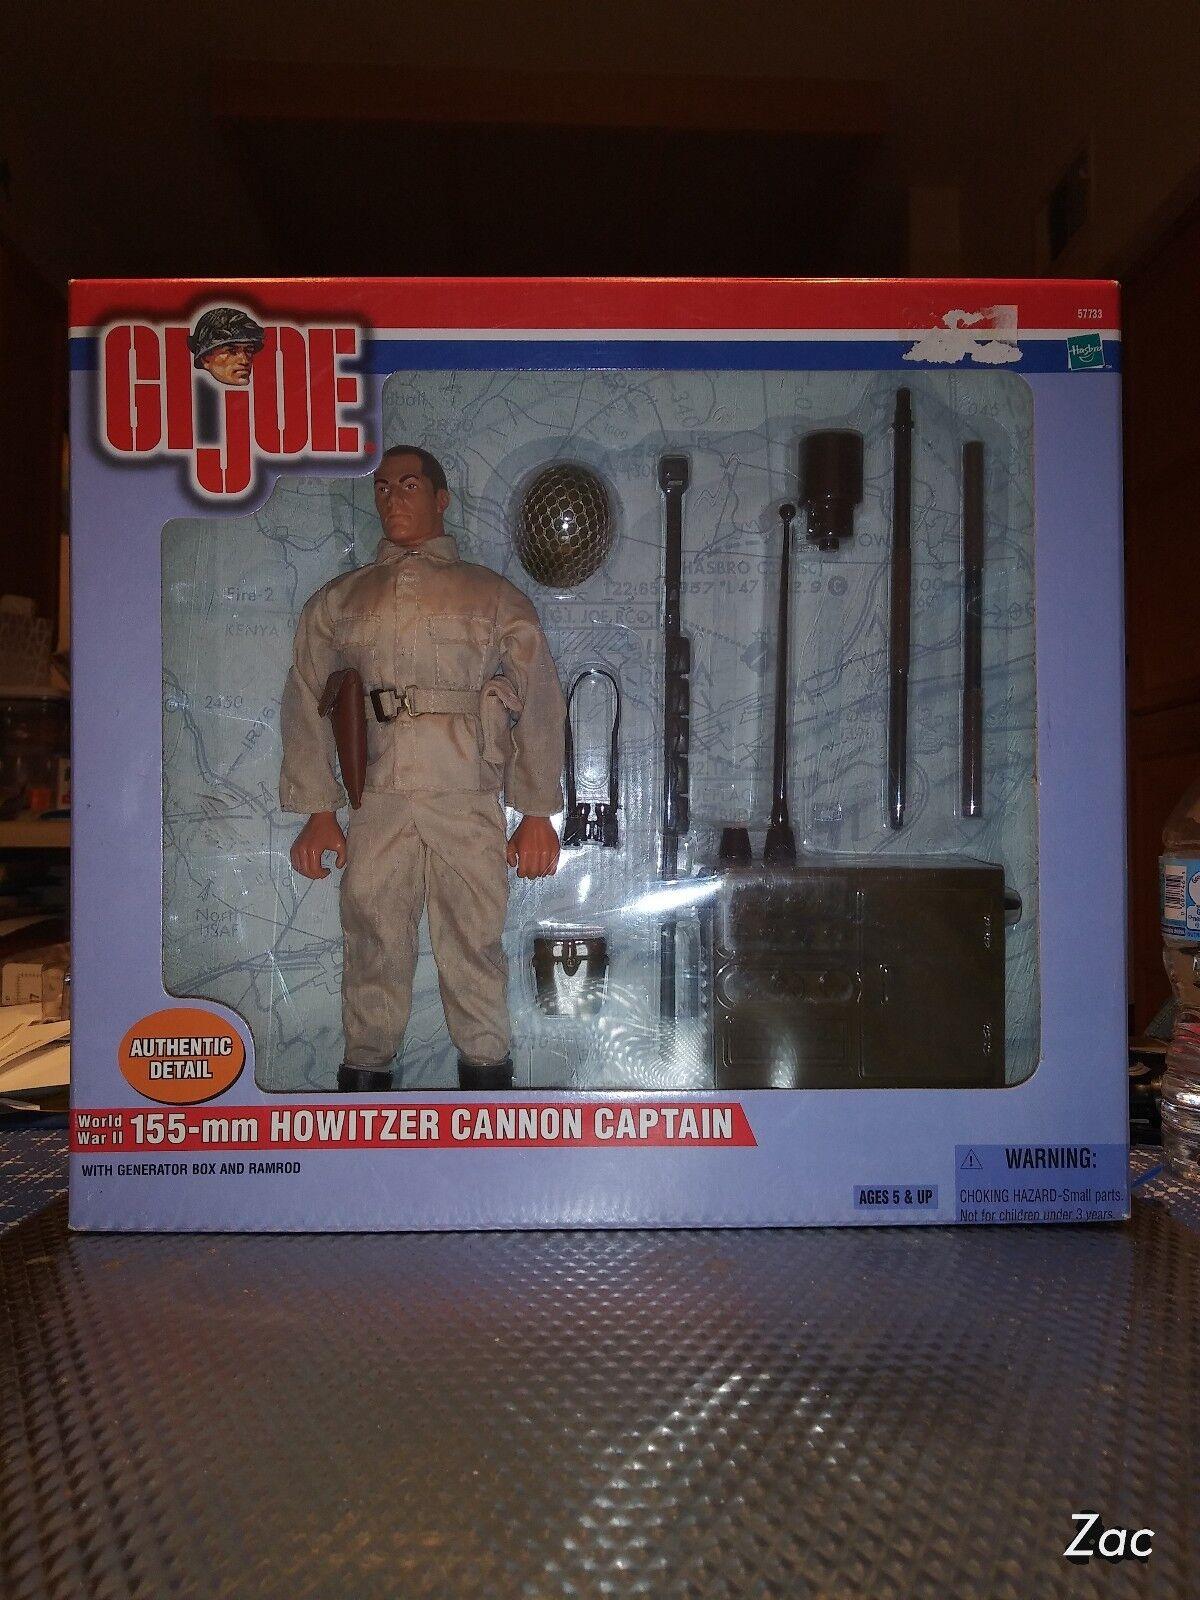 G.I.Joe WWII 155mm Howitzer Cannon Captain